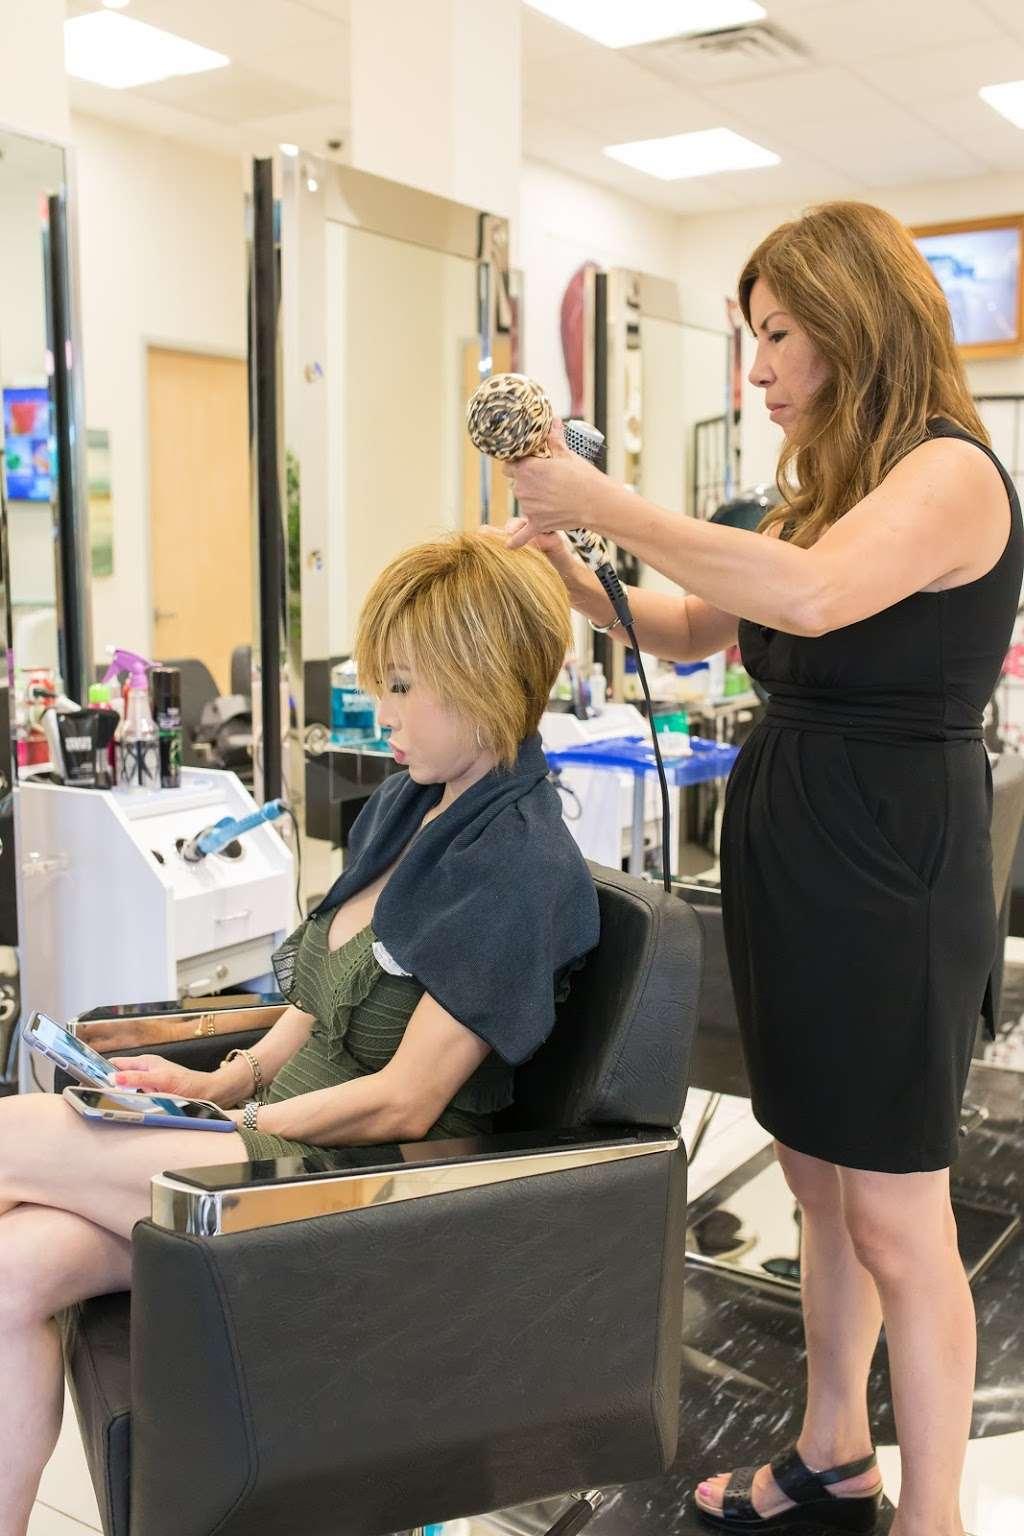 Cozy Hair Salon - hair care  | Photo 6 of 10 | Address: 2814 S Shepherd Dr, Houston, TX 77098, USA | Phone: (832) 684-9699